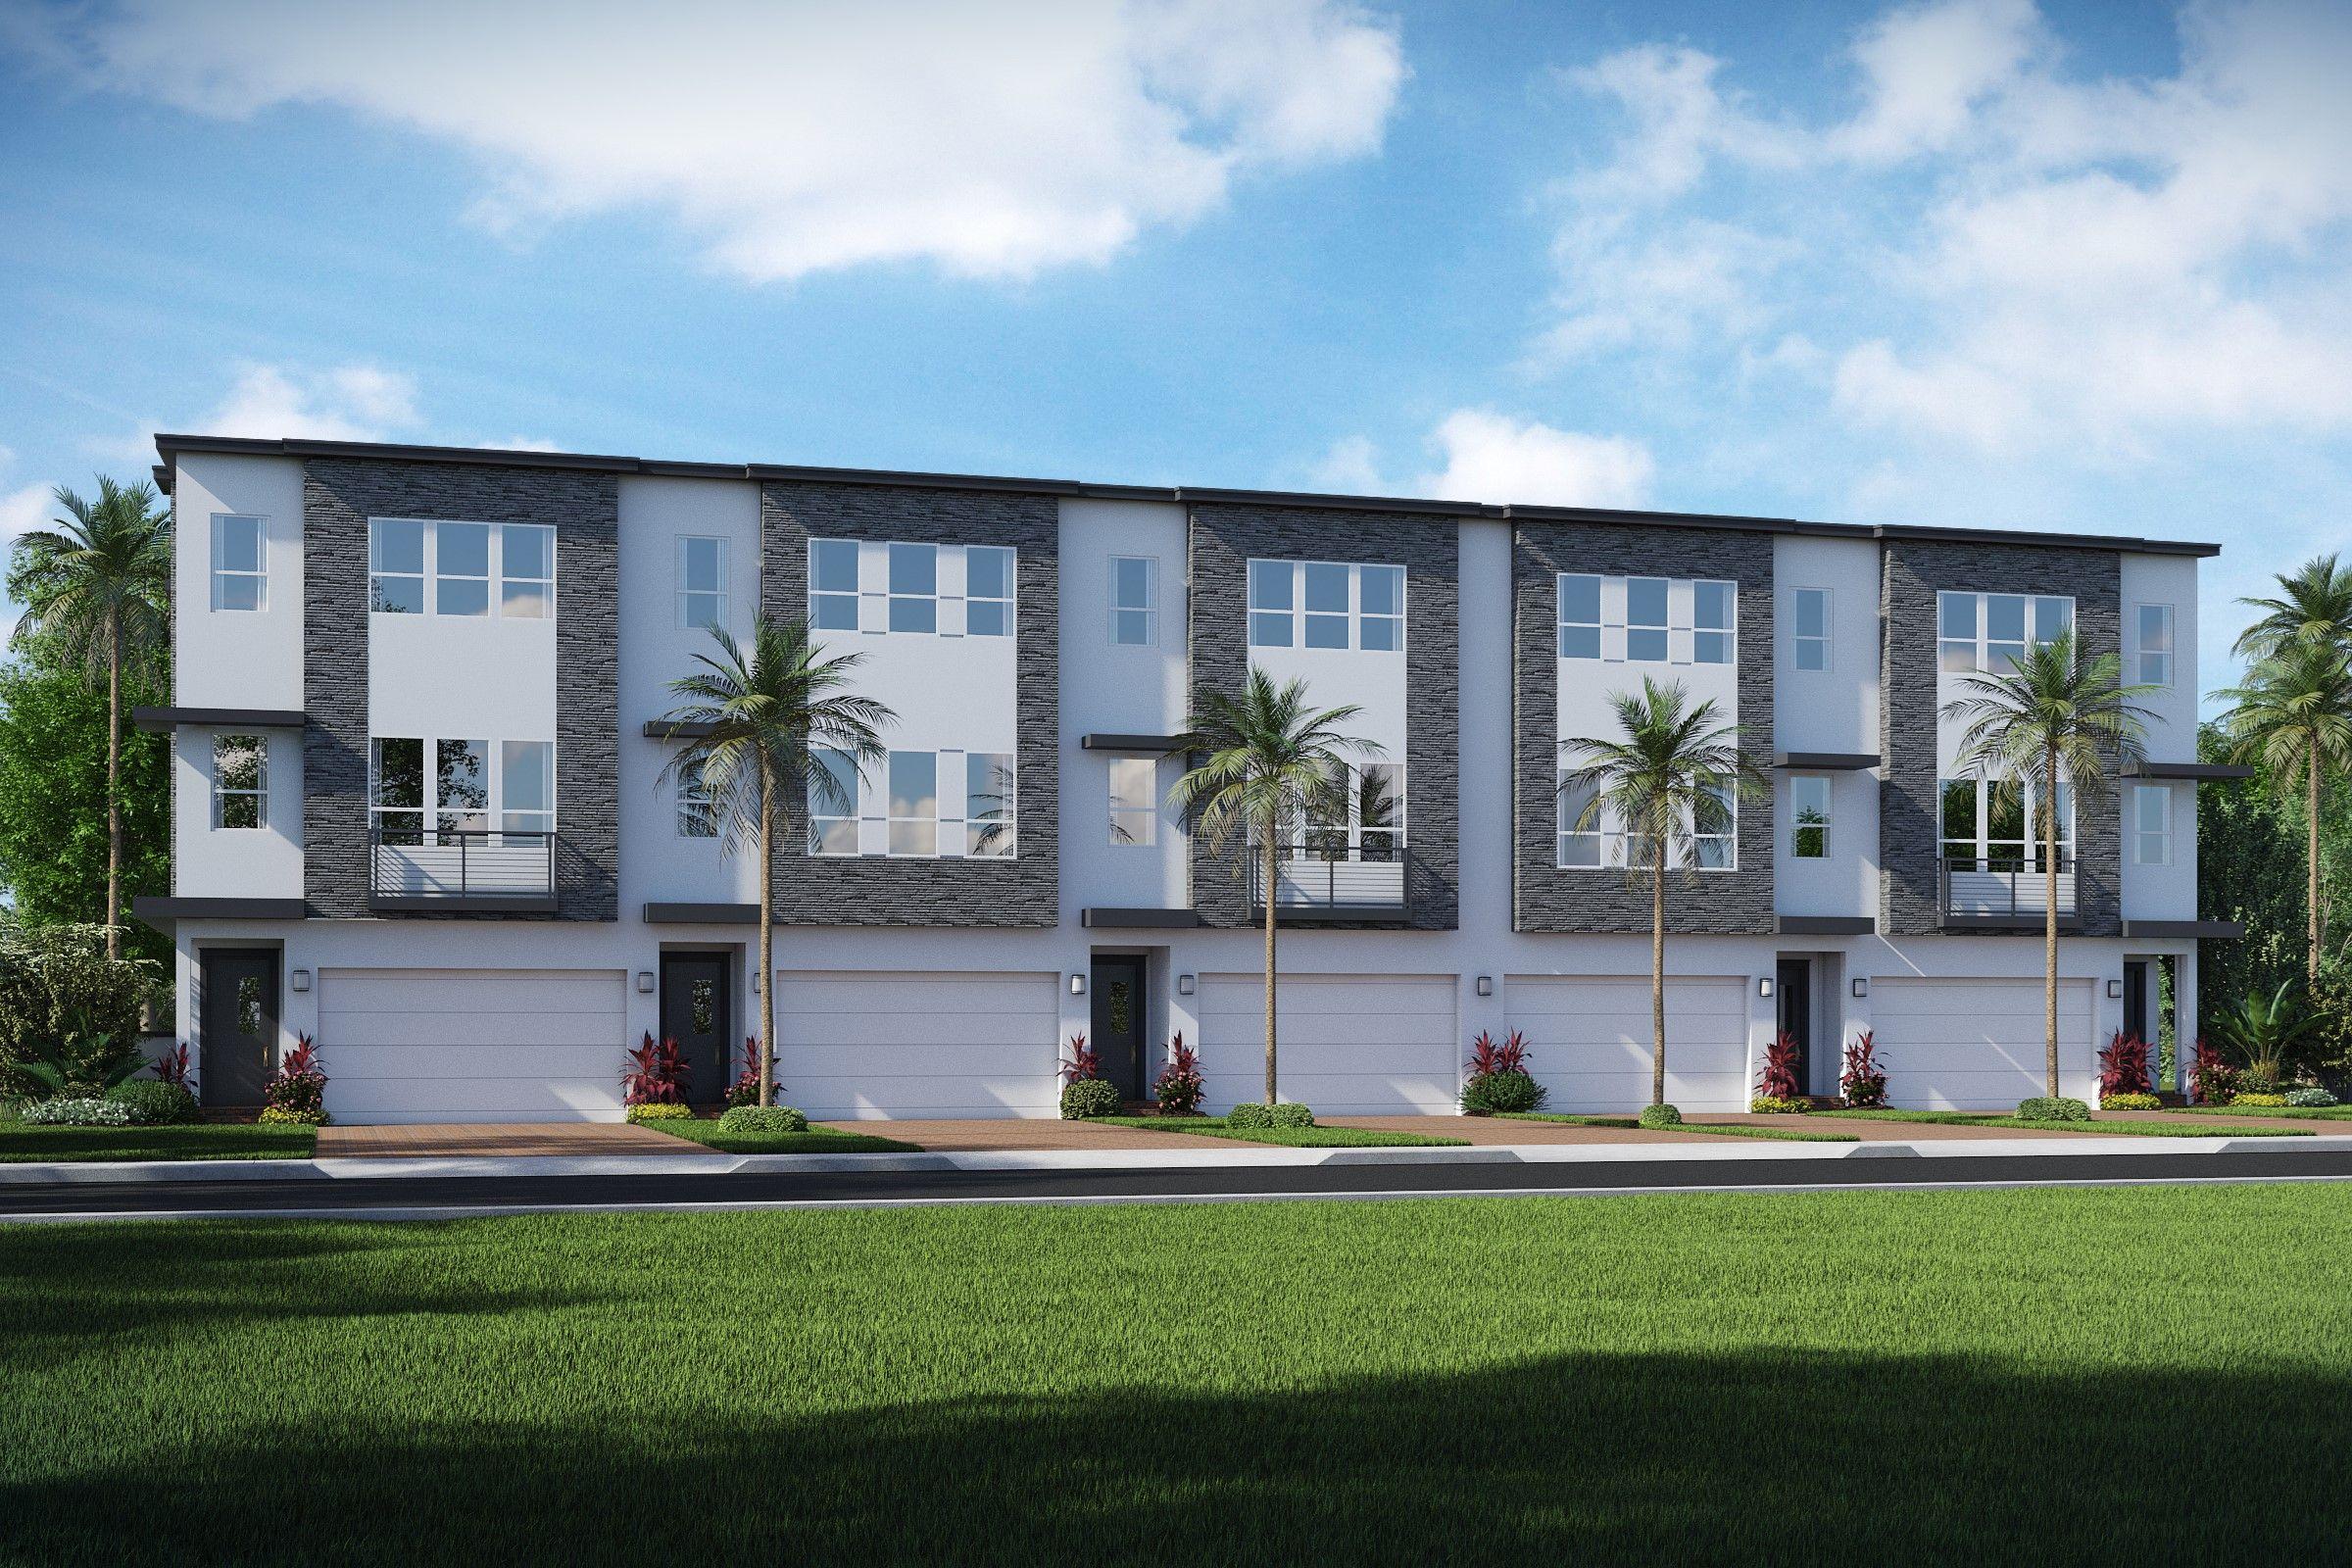 Multi Familie für Verkauf beim Bonnett 2900 Nw 12th Terrace, Homesite 2 Oakland Park, Florida 33334 United States